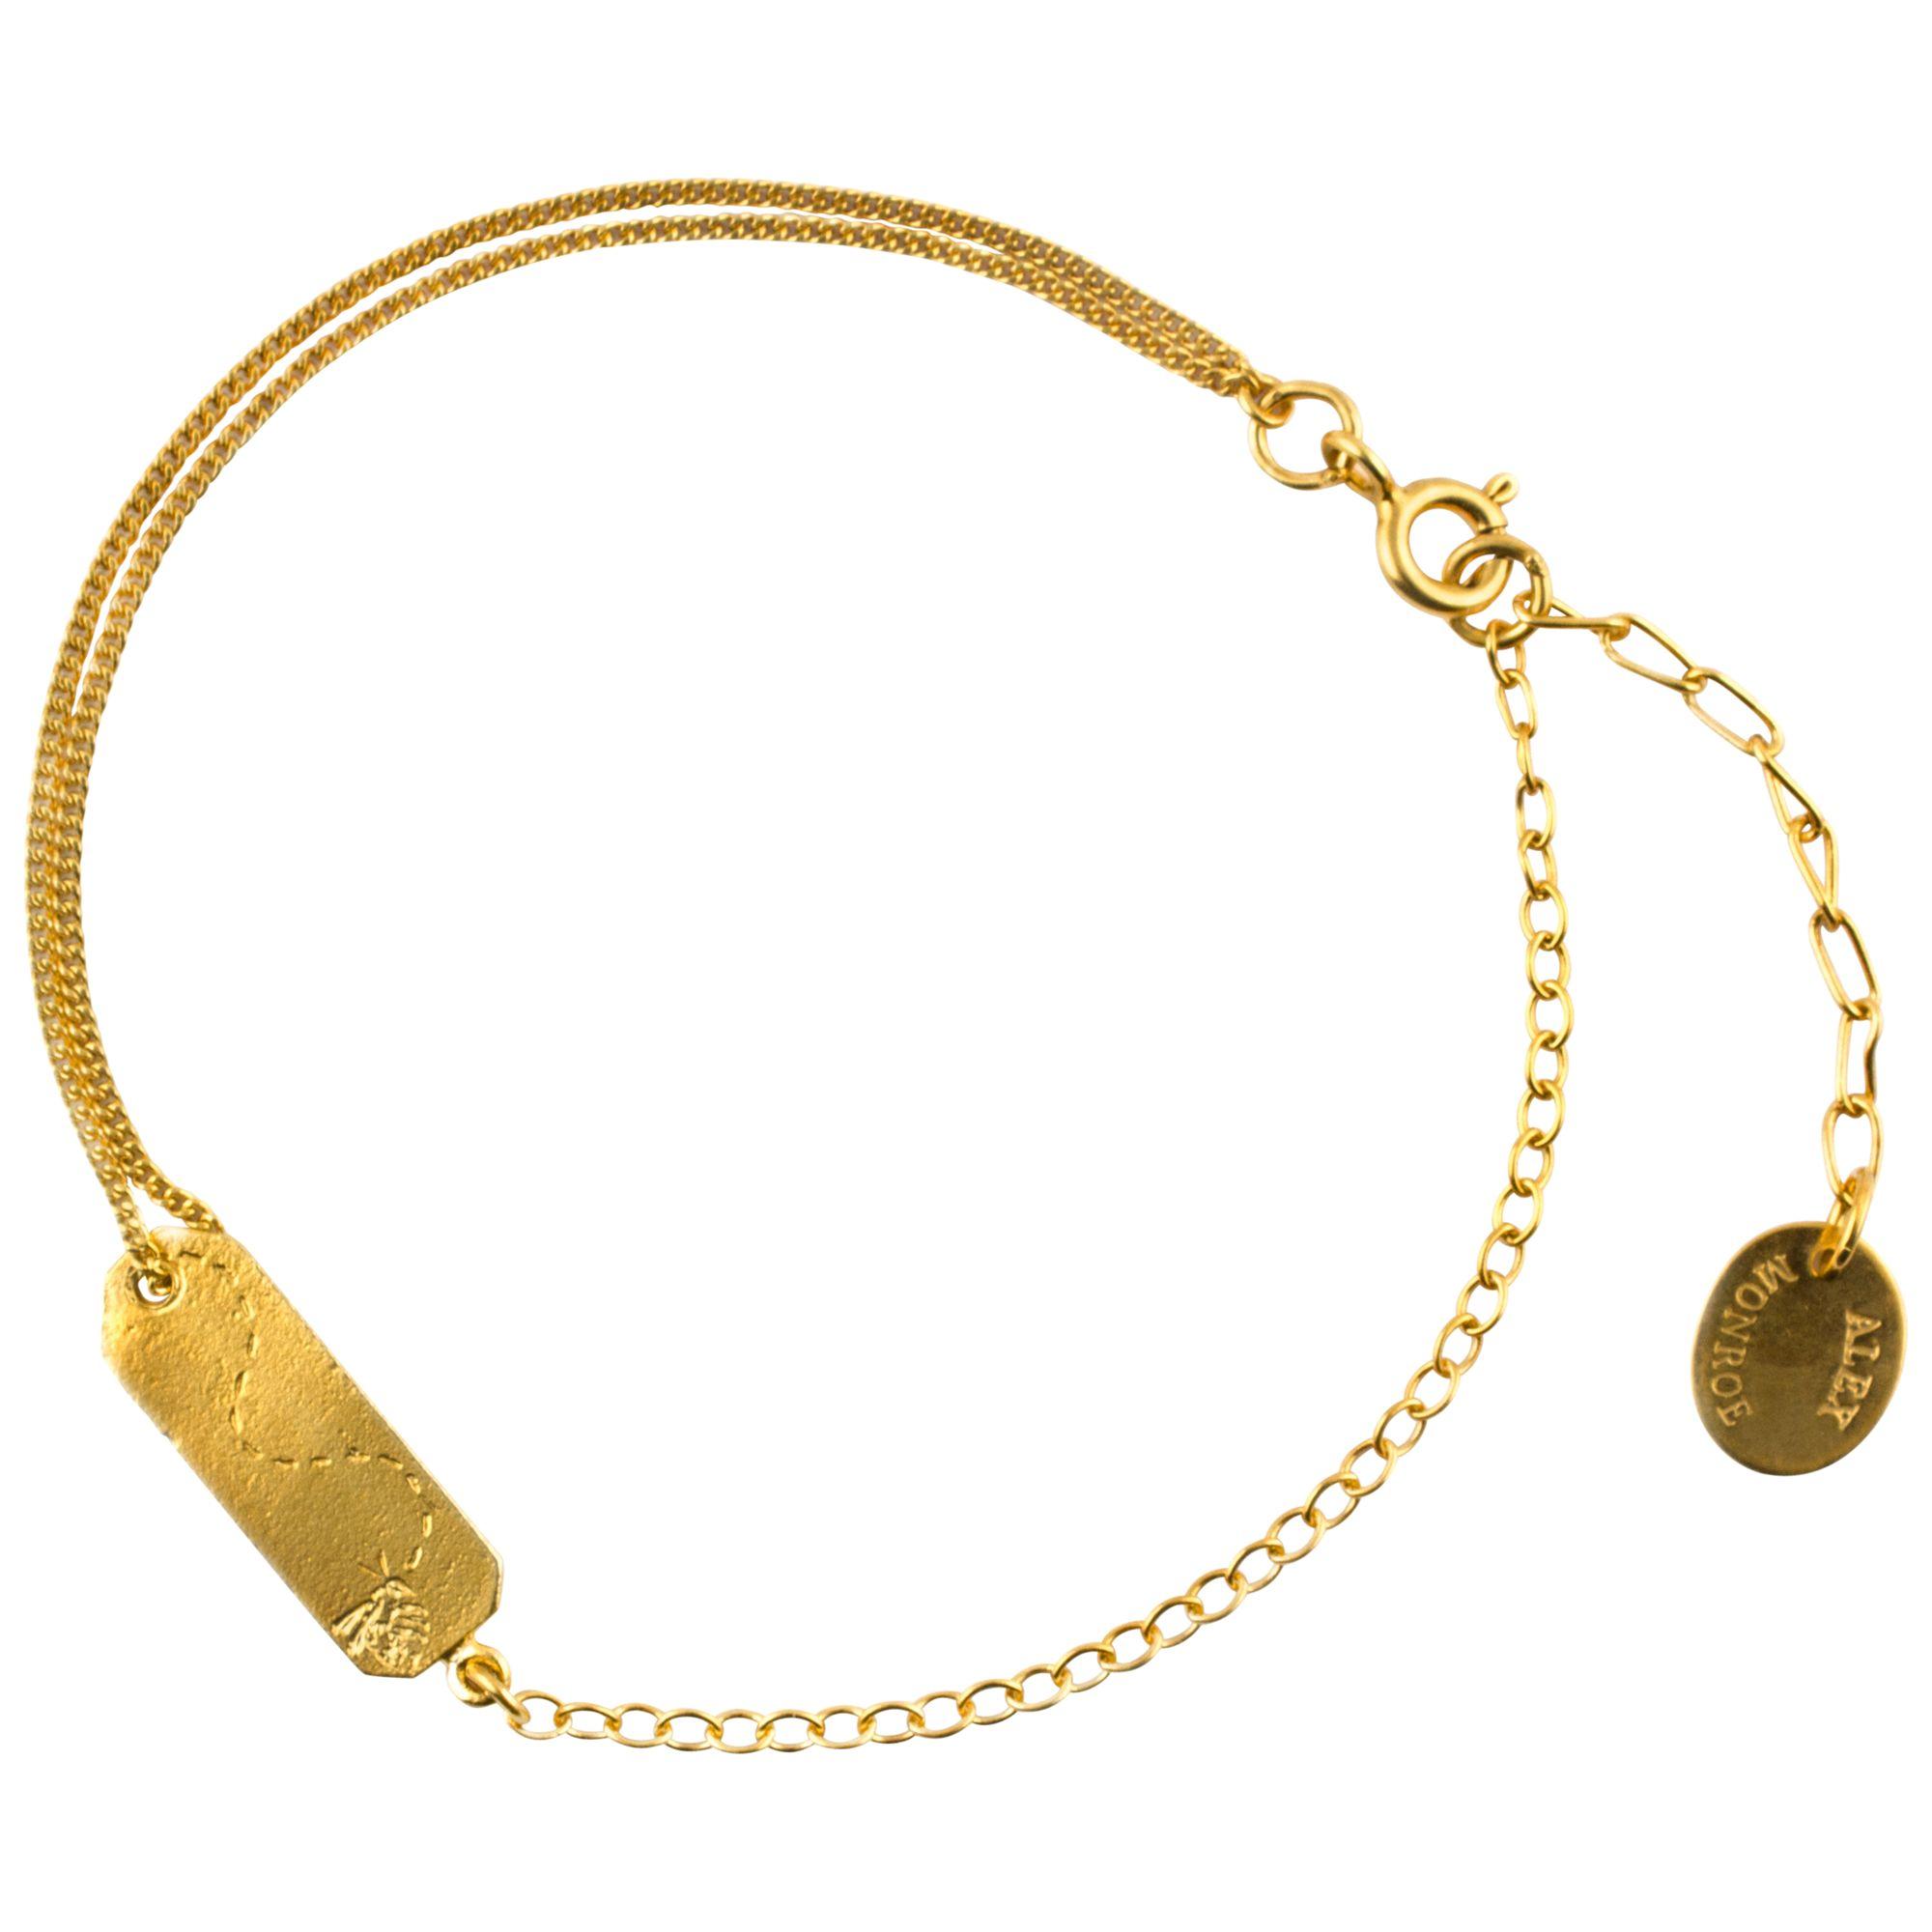 Alex Monroe Alex Monroe 22ct Gold Plated Sterling Silver Time Flies Tag Bracelet, Gold